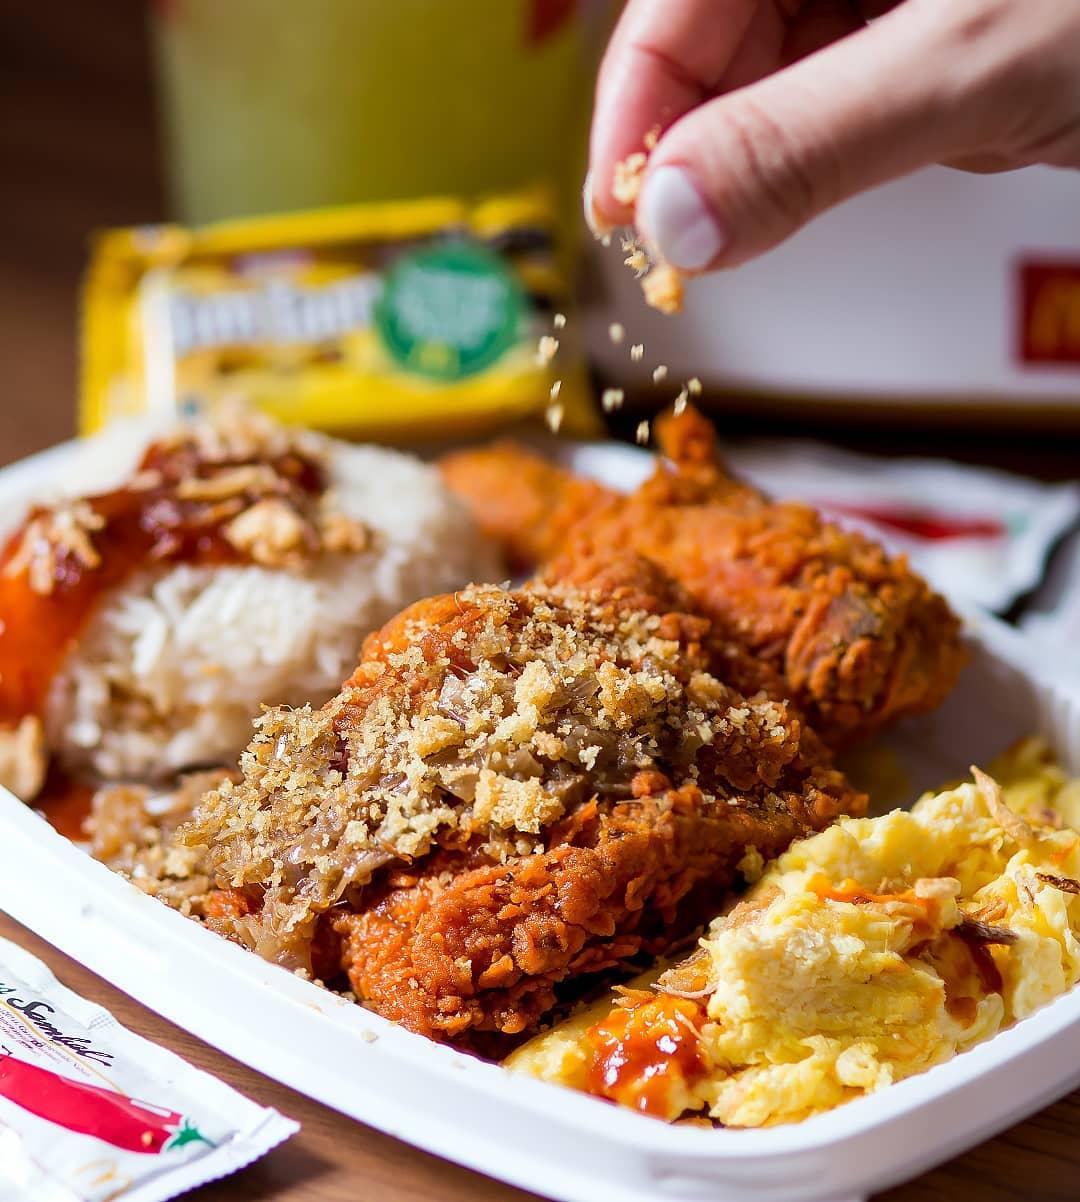 mcdonalds-ayam-kremes-sambal-matah